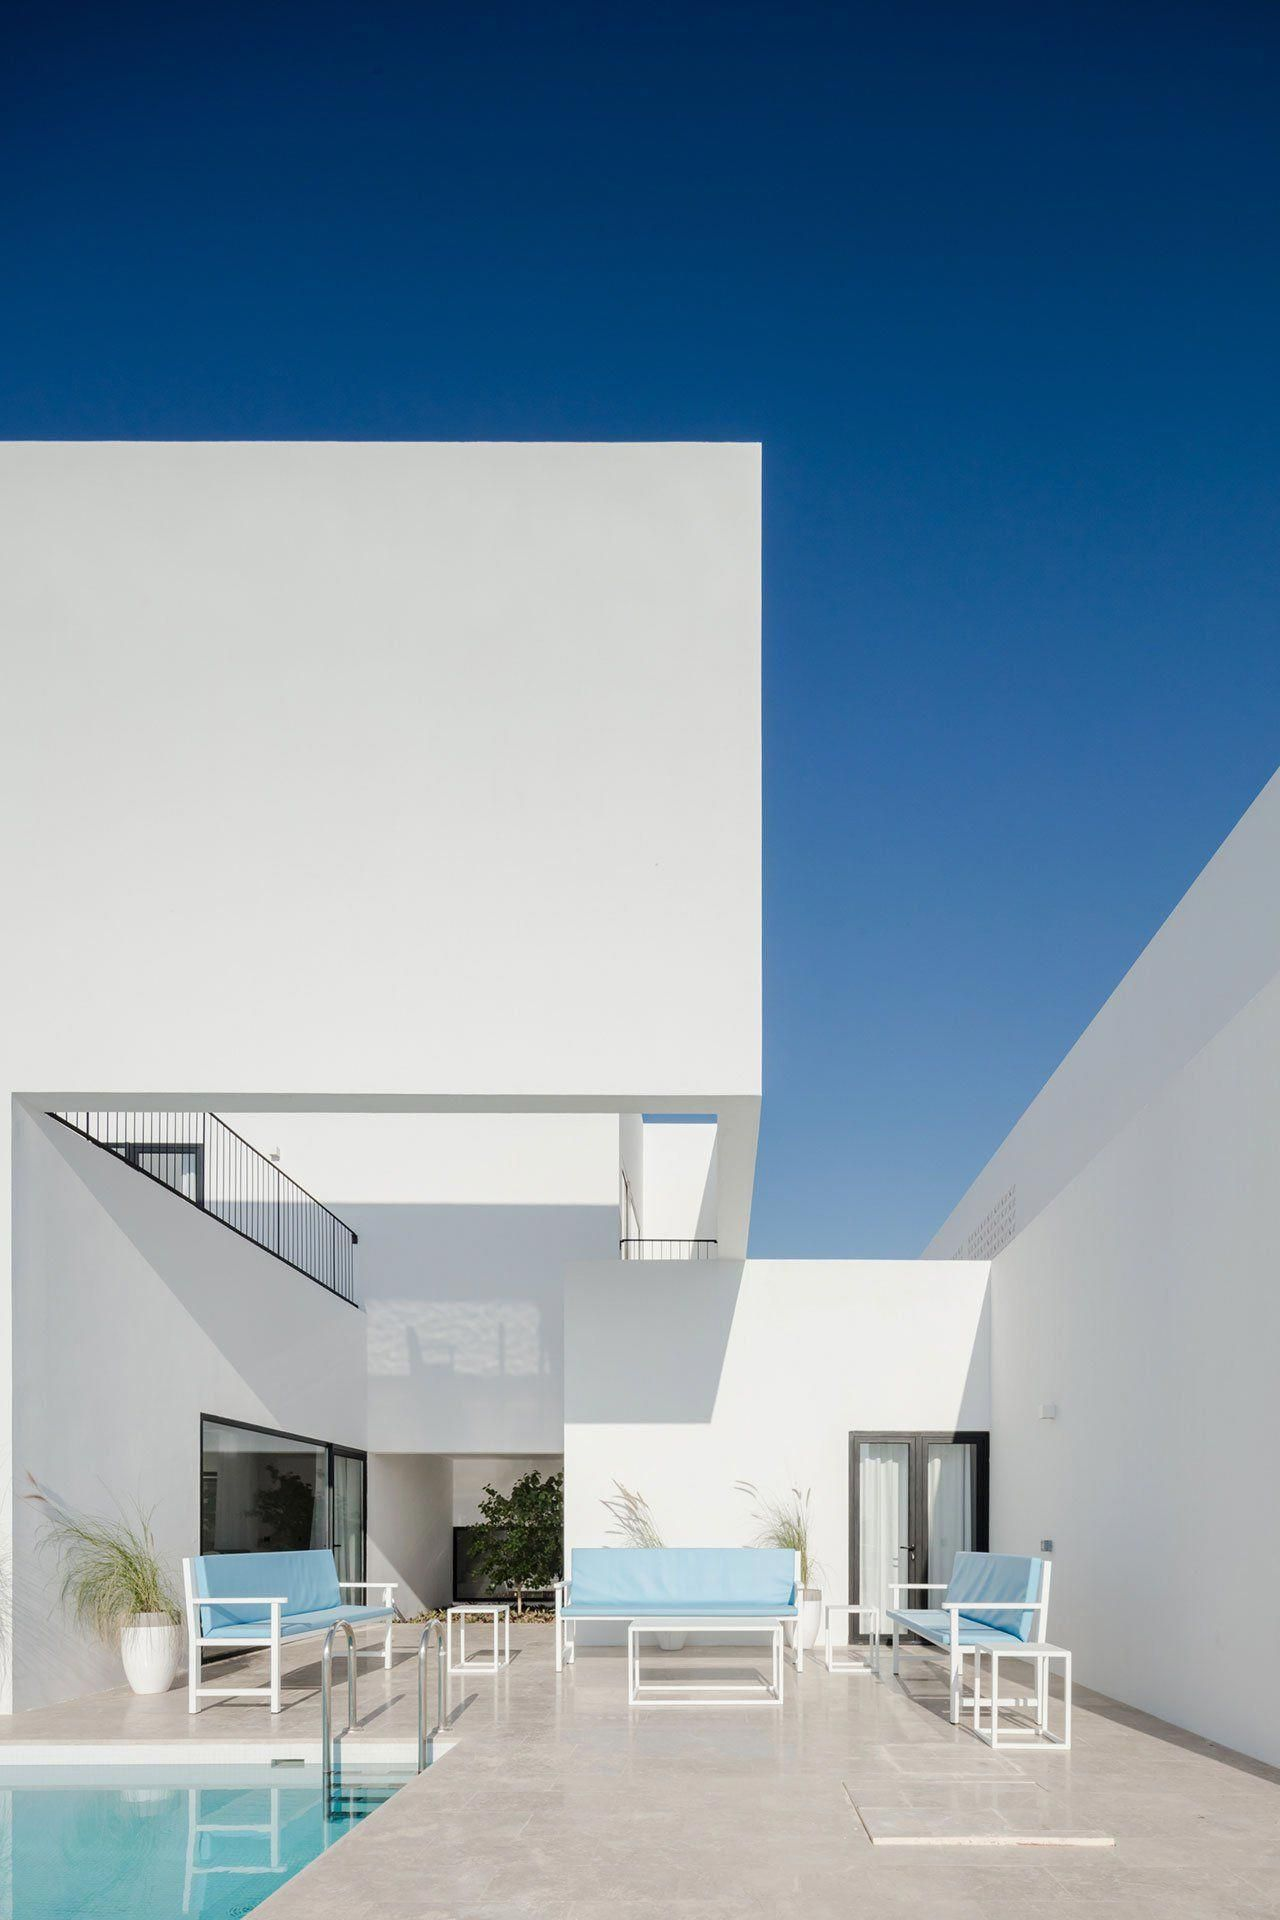 Photo joao morgado sweet home make interior decoration design ideas also rh in pinterest